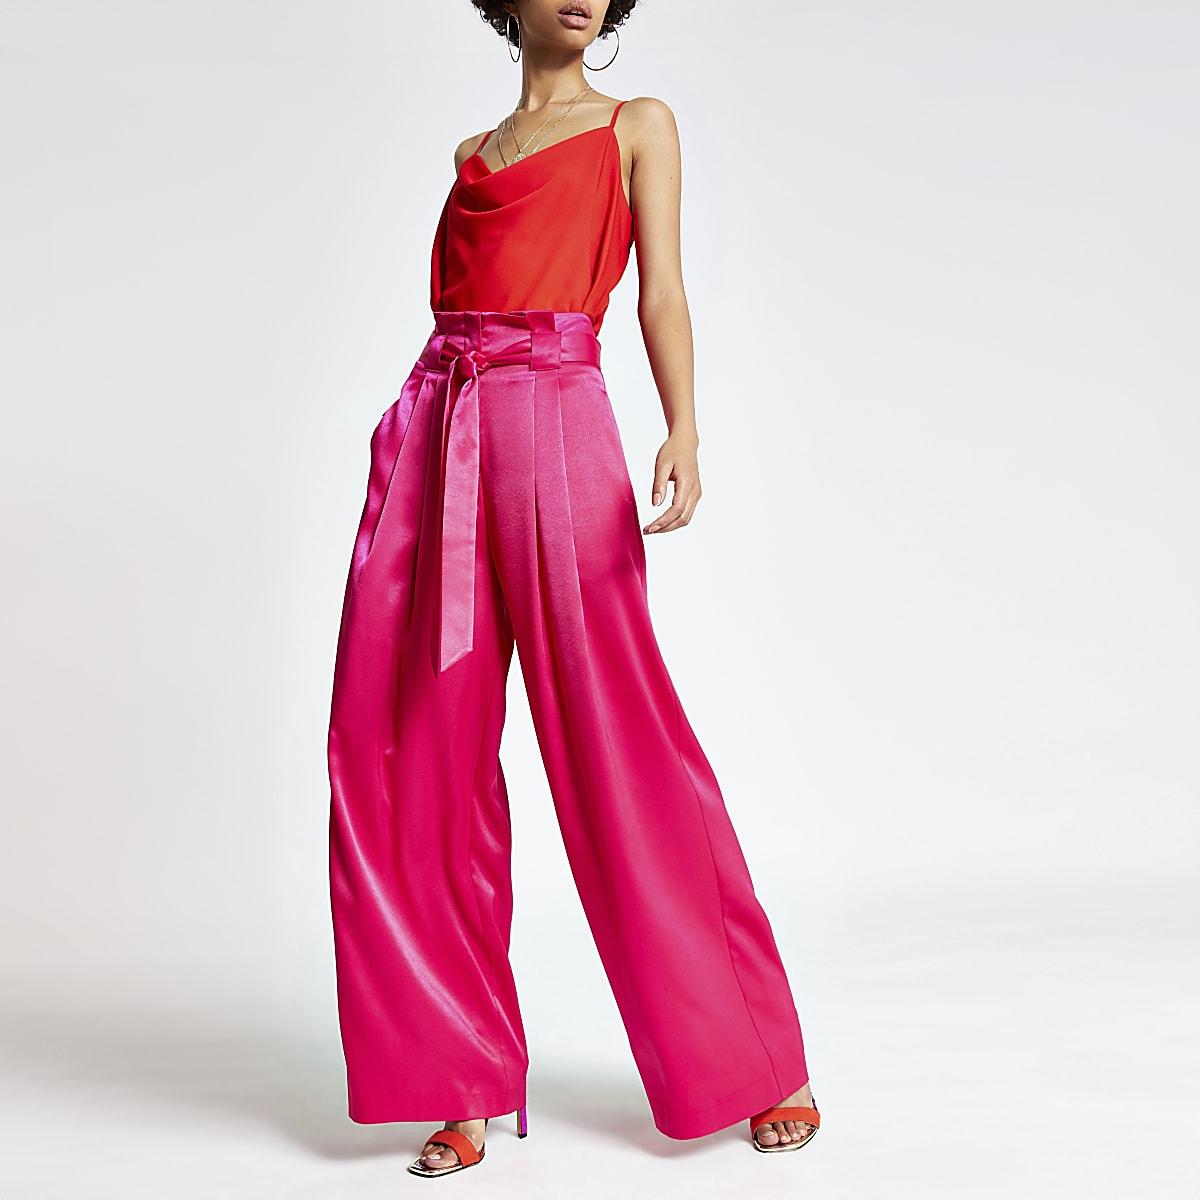 Bright pink wide leg pants